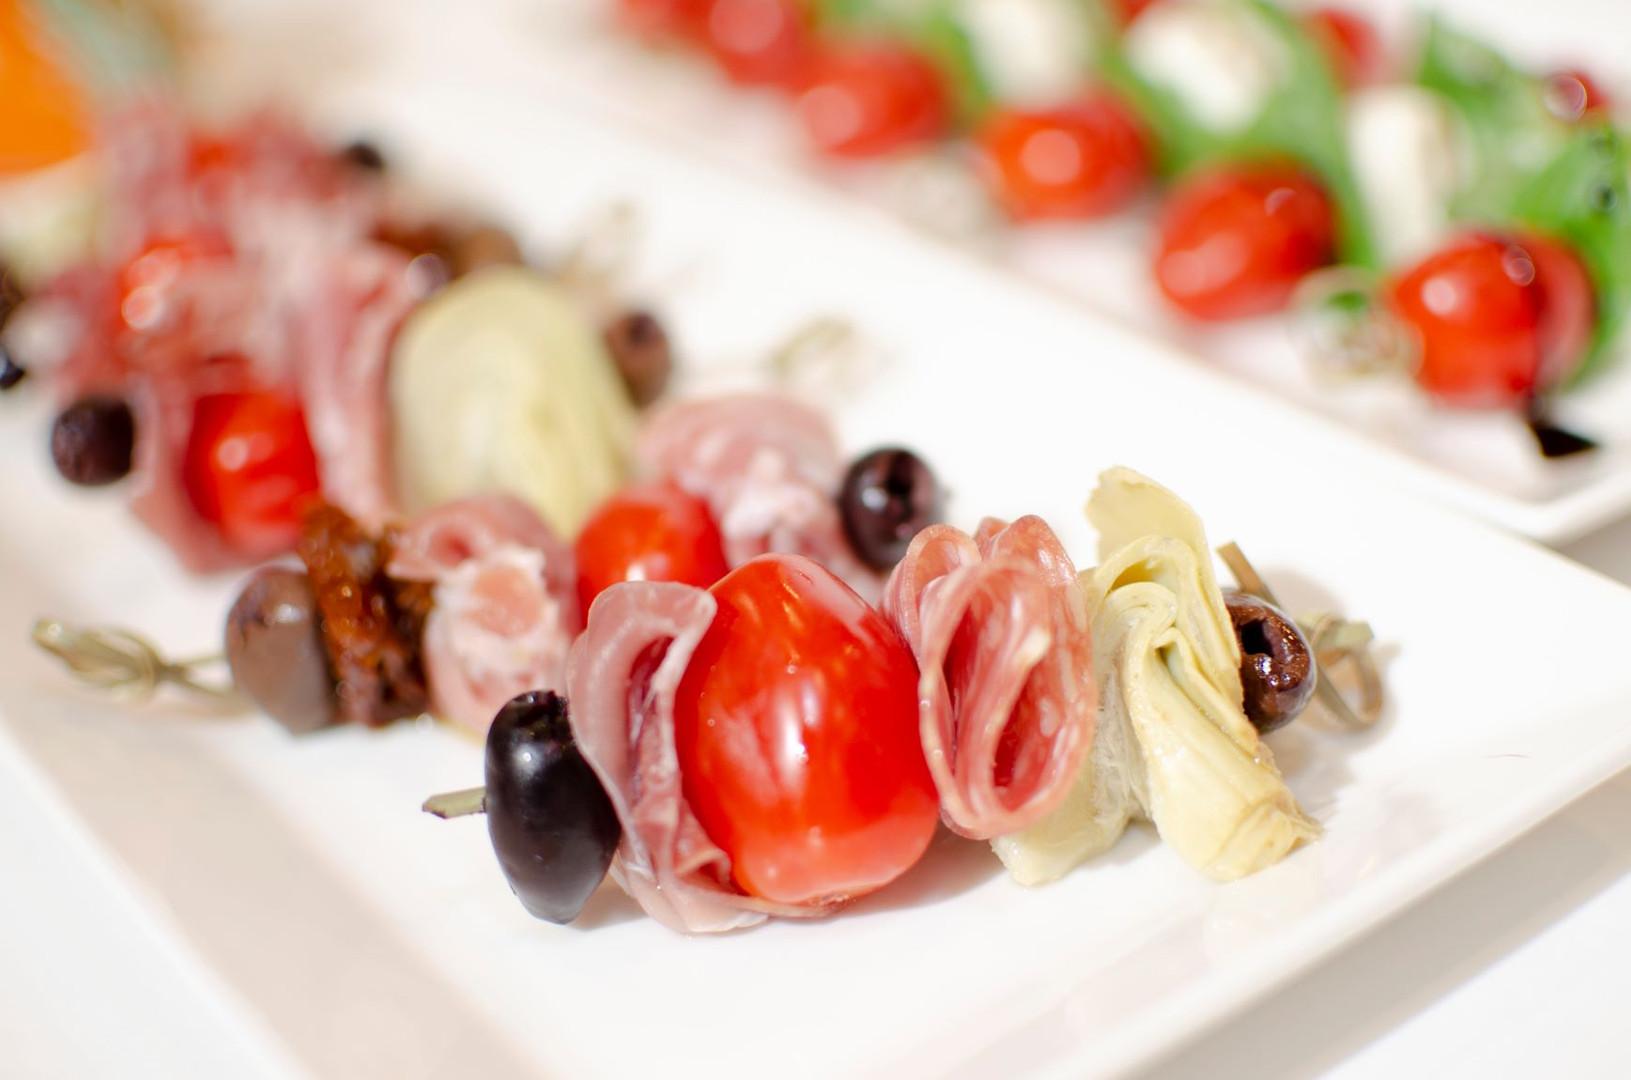 MJC MKTG Food Photography, Caprese and Antipasto Skewers